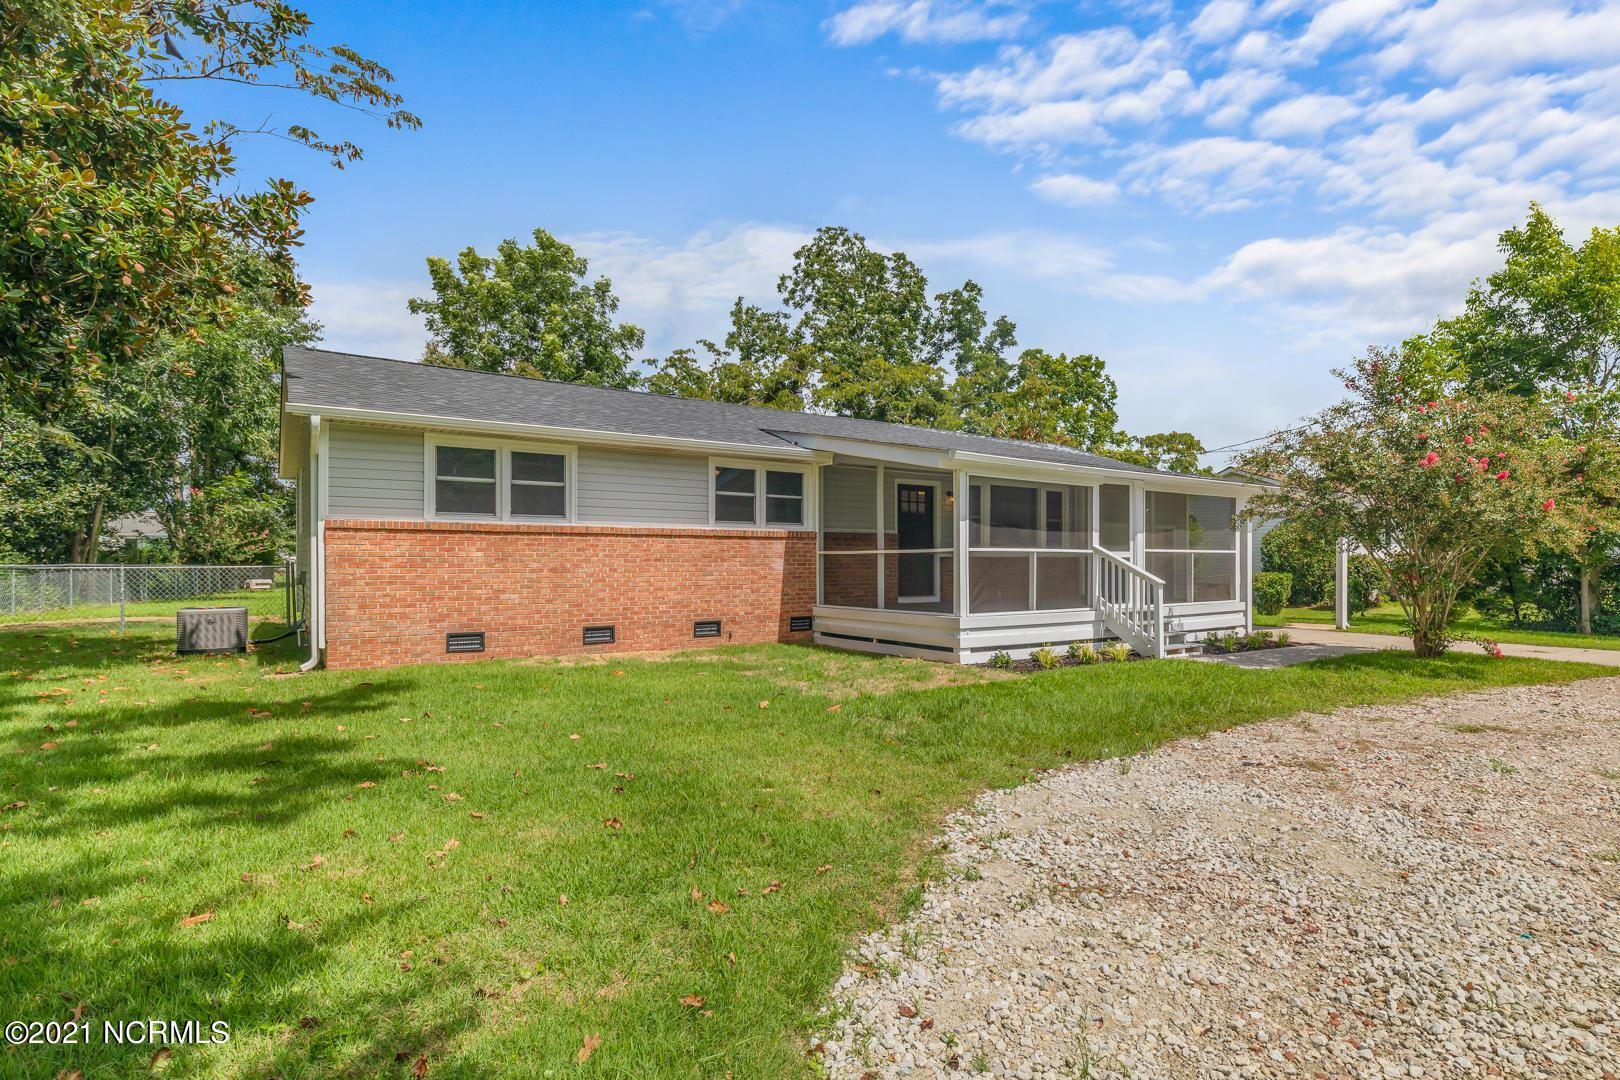 Photo of 404 Old Hammock Road, Swansboro, NC 28584 (MLS # 100287245)